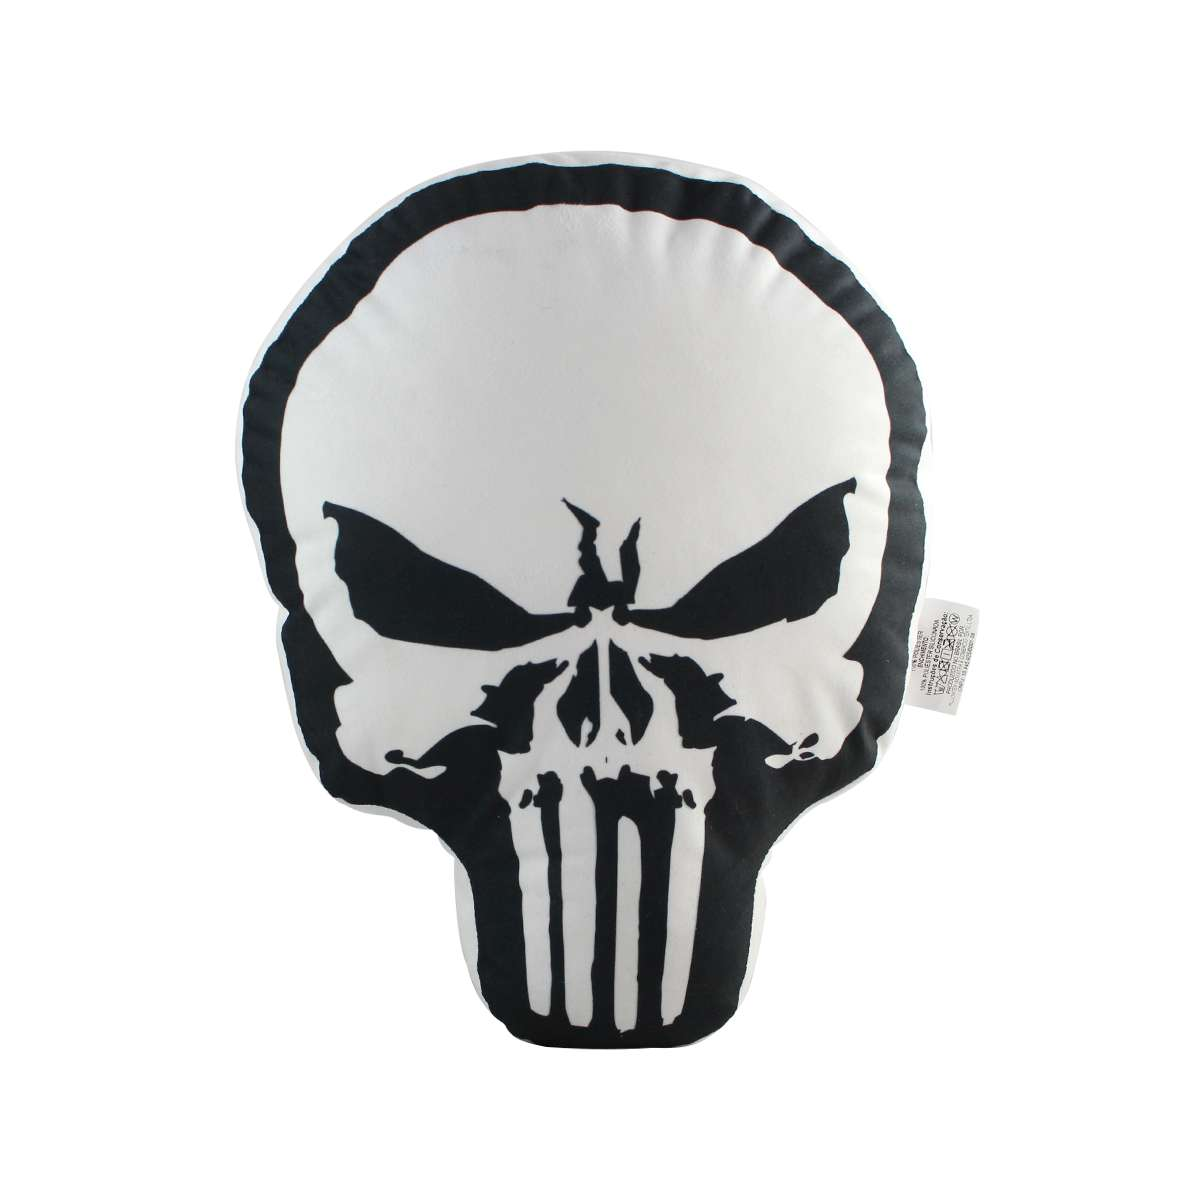 Almofada Caveira Punisher Justiceiro Anti Herói HQ Marvel